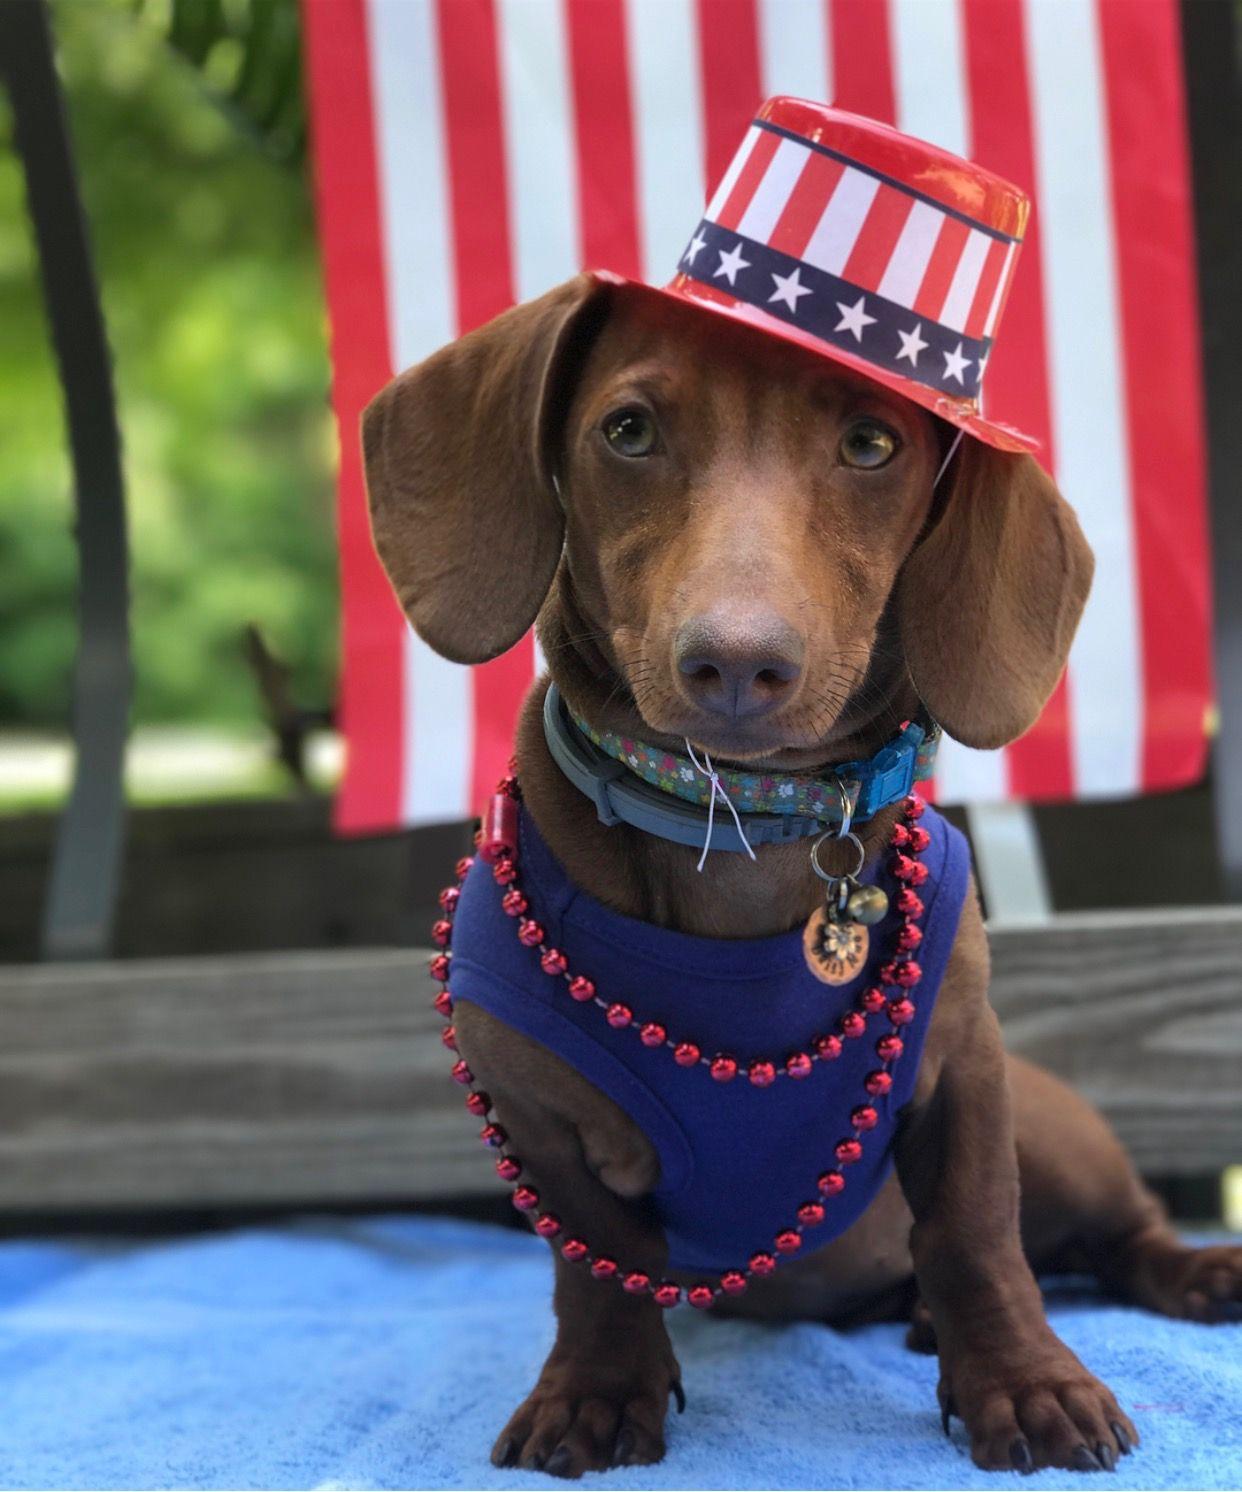 Pin by Nancy S on Dachshund Holidays! Dog daycare